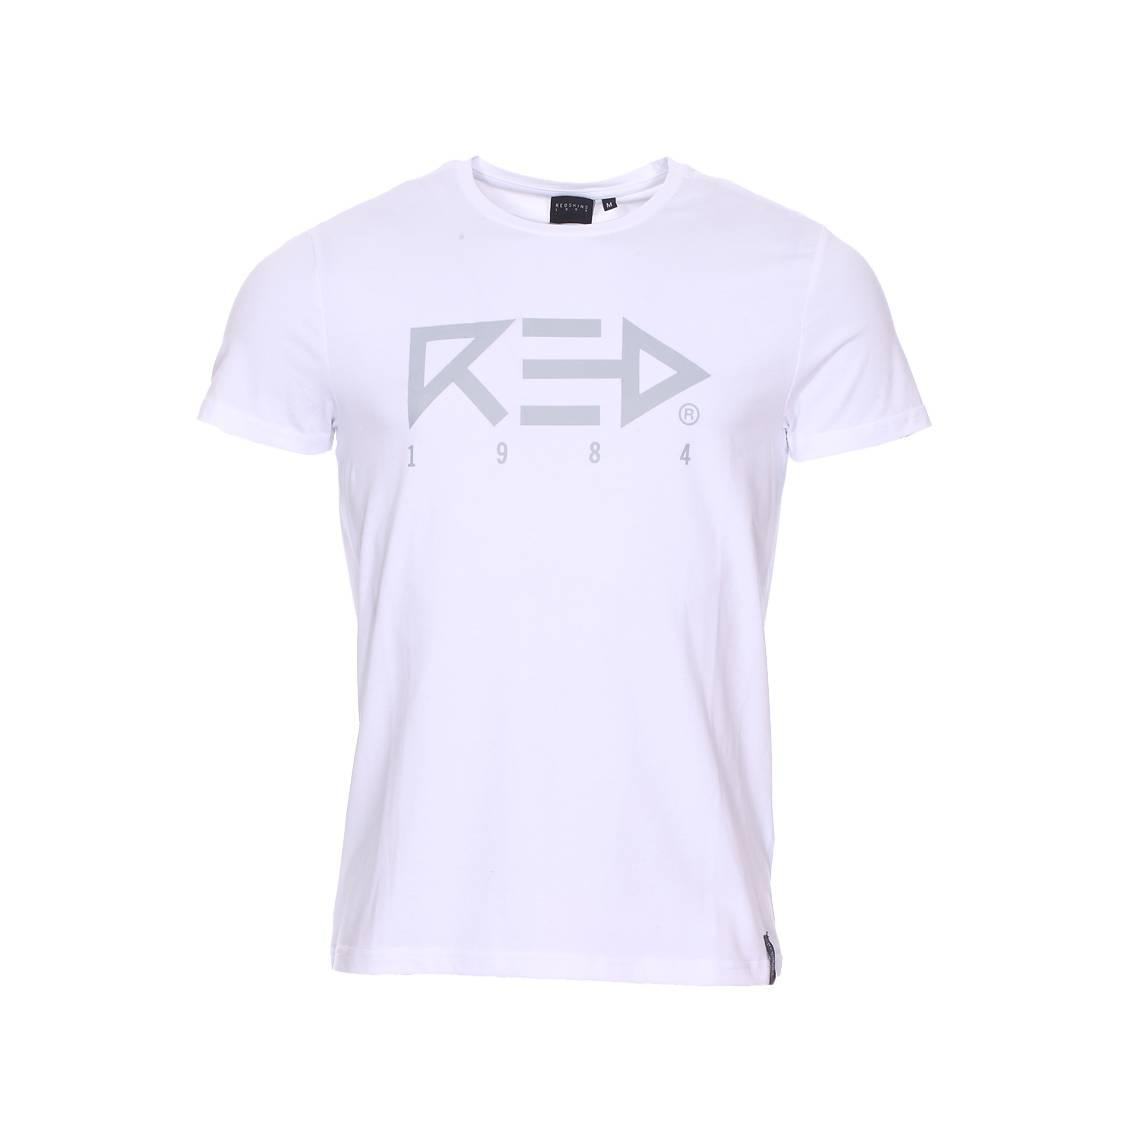 Tee-shirt col rond  arrow en coton stretch blanc floqué